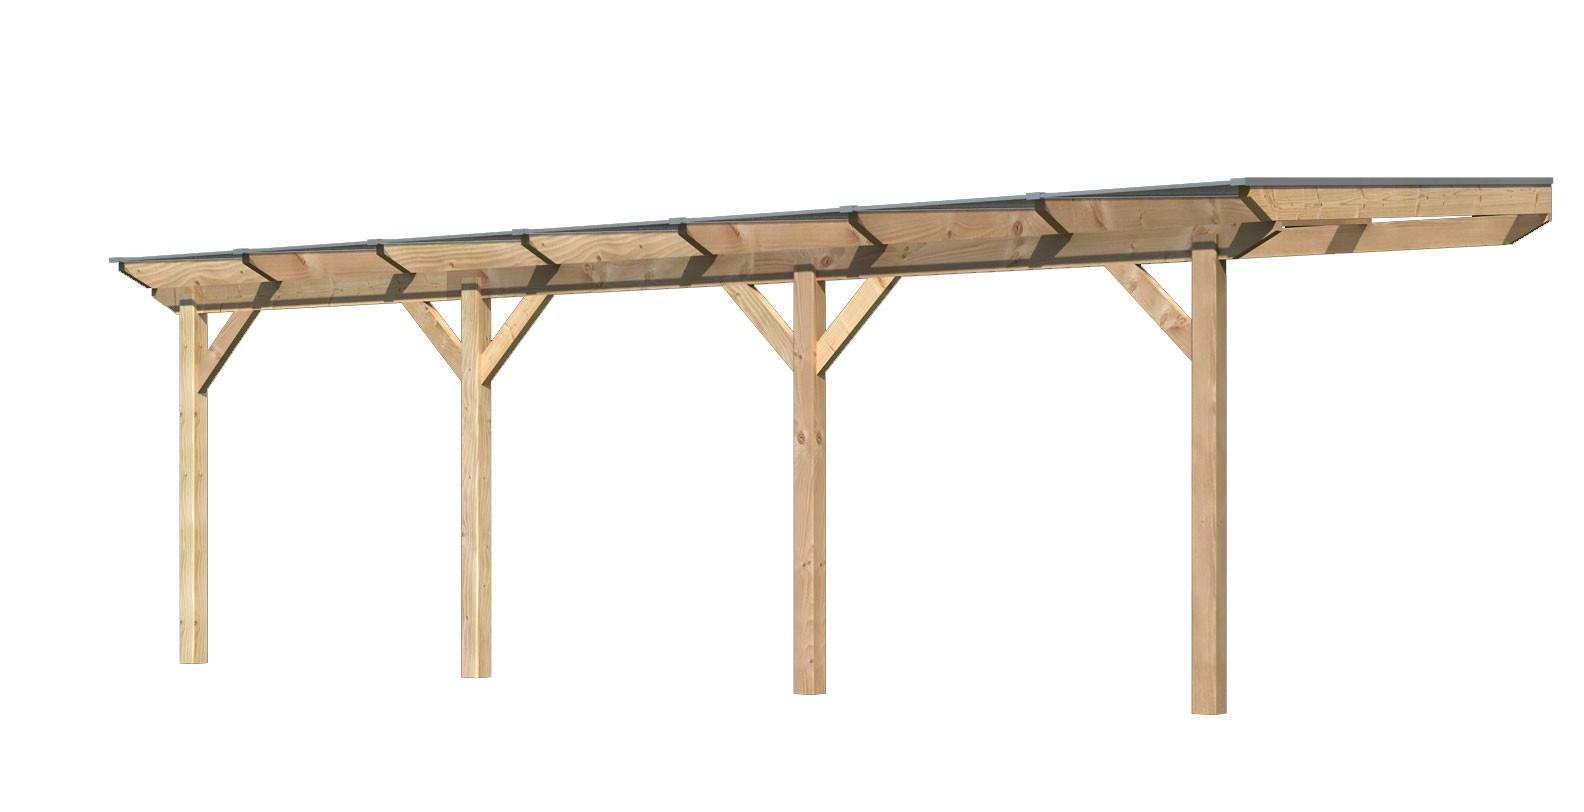 Terrassenüberdachung Karibu Modell 3 C gerade Douglasie 714x350cm Bild 1